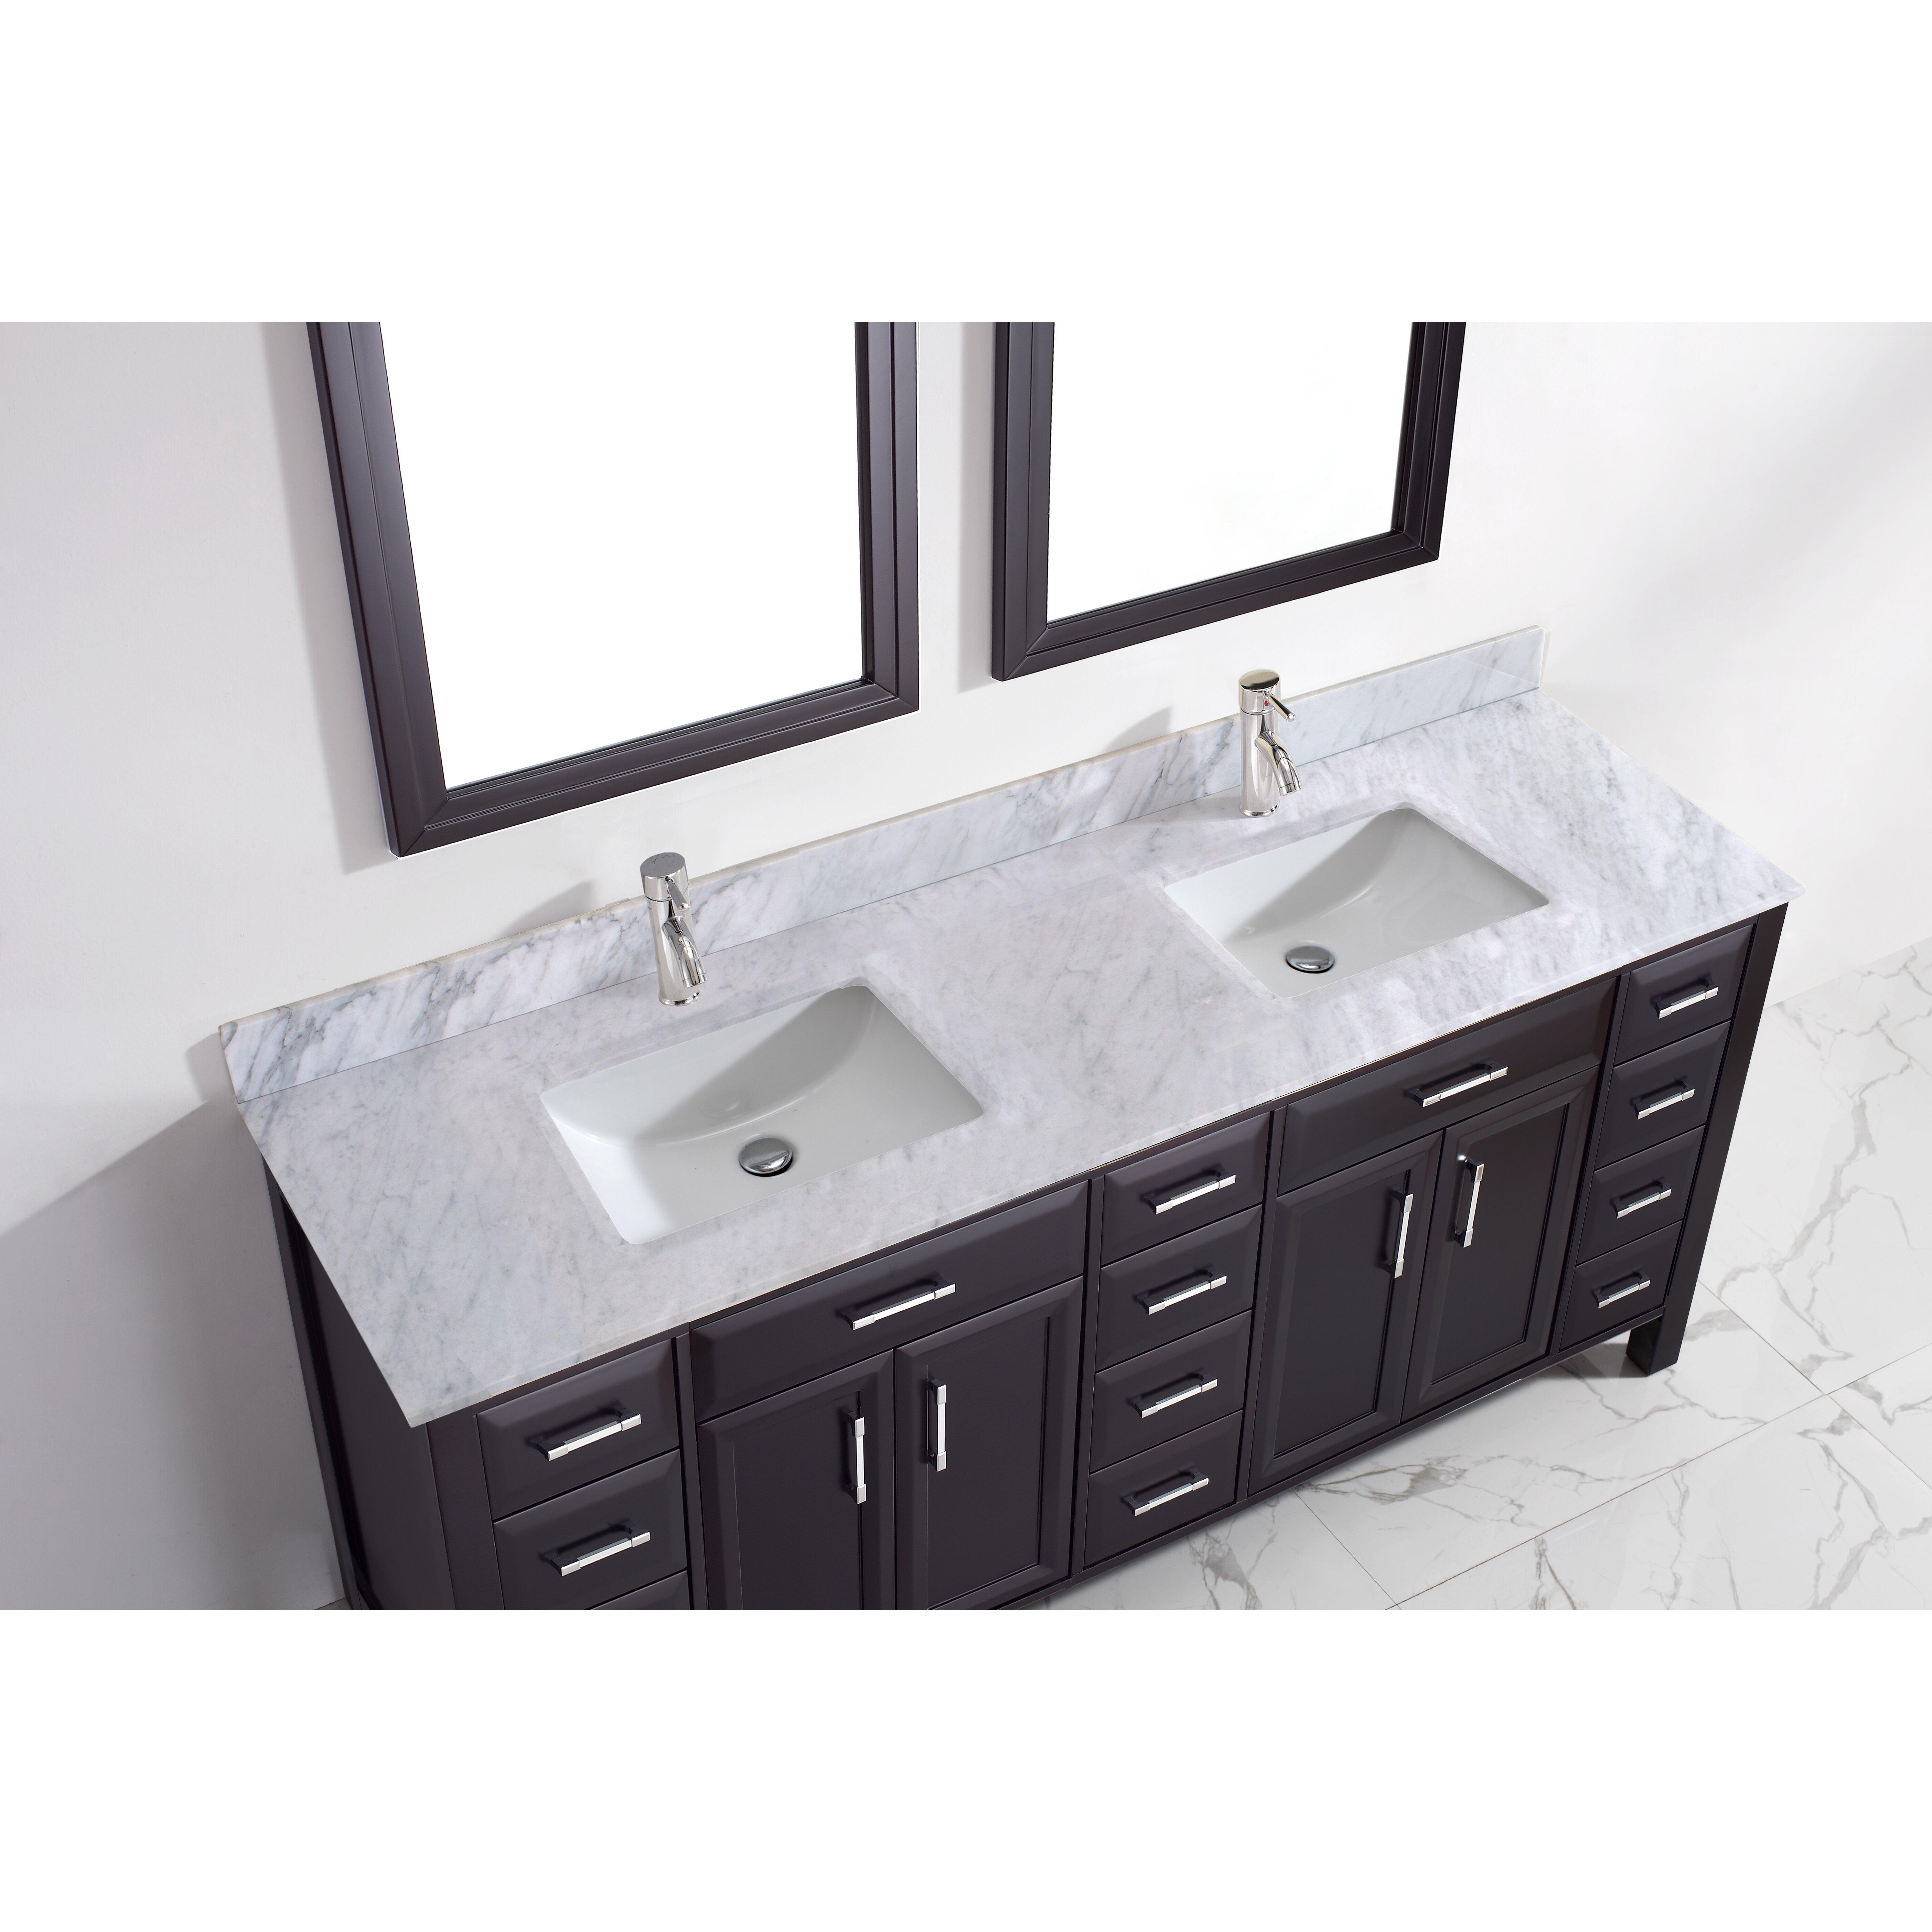 Bauhaus Bath Caledonia 75 Double Bathroom Vanity Set Reviews Wayfair Supply